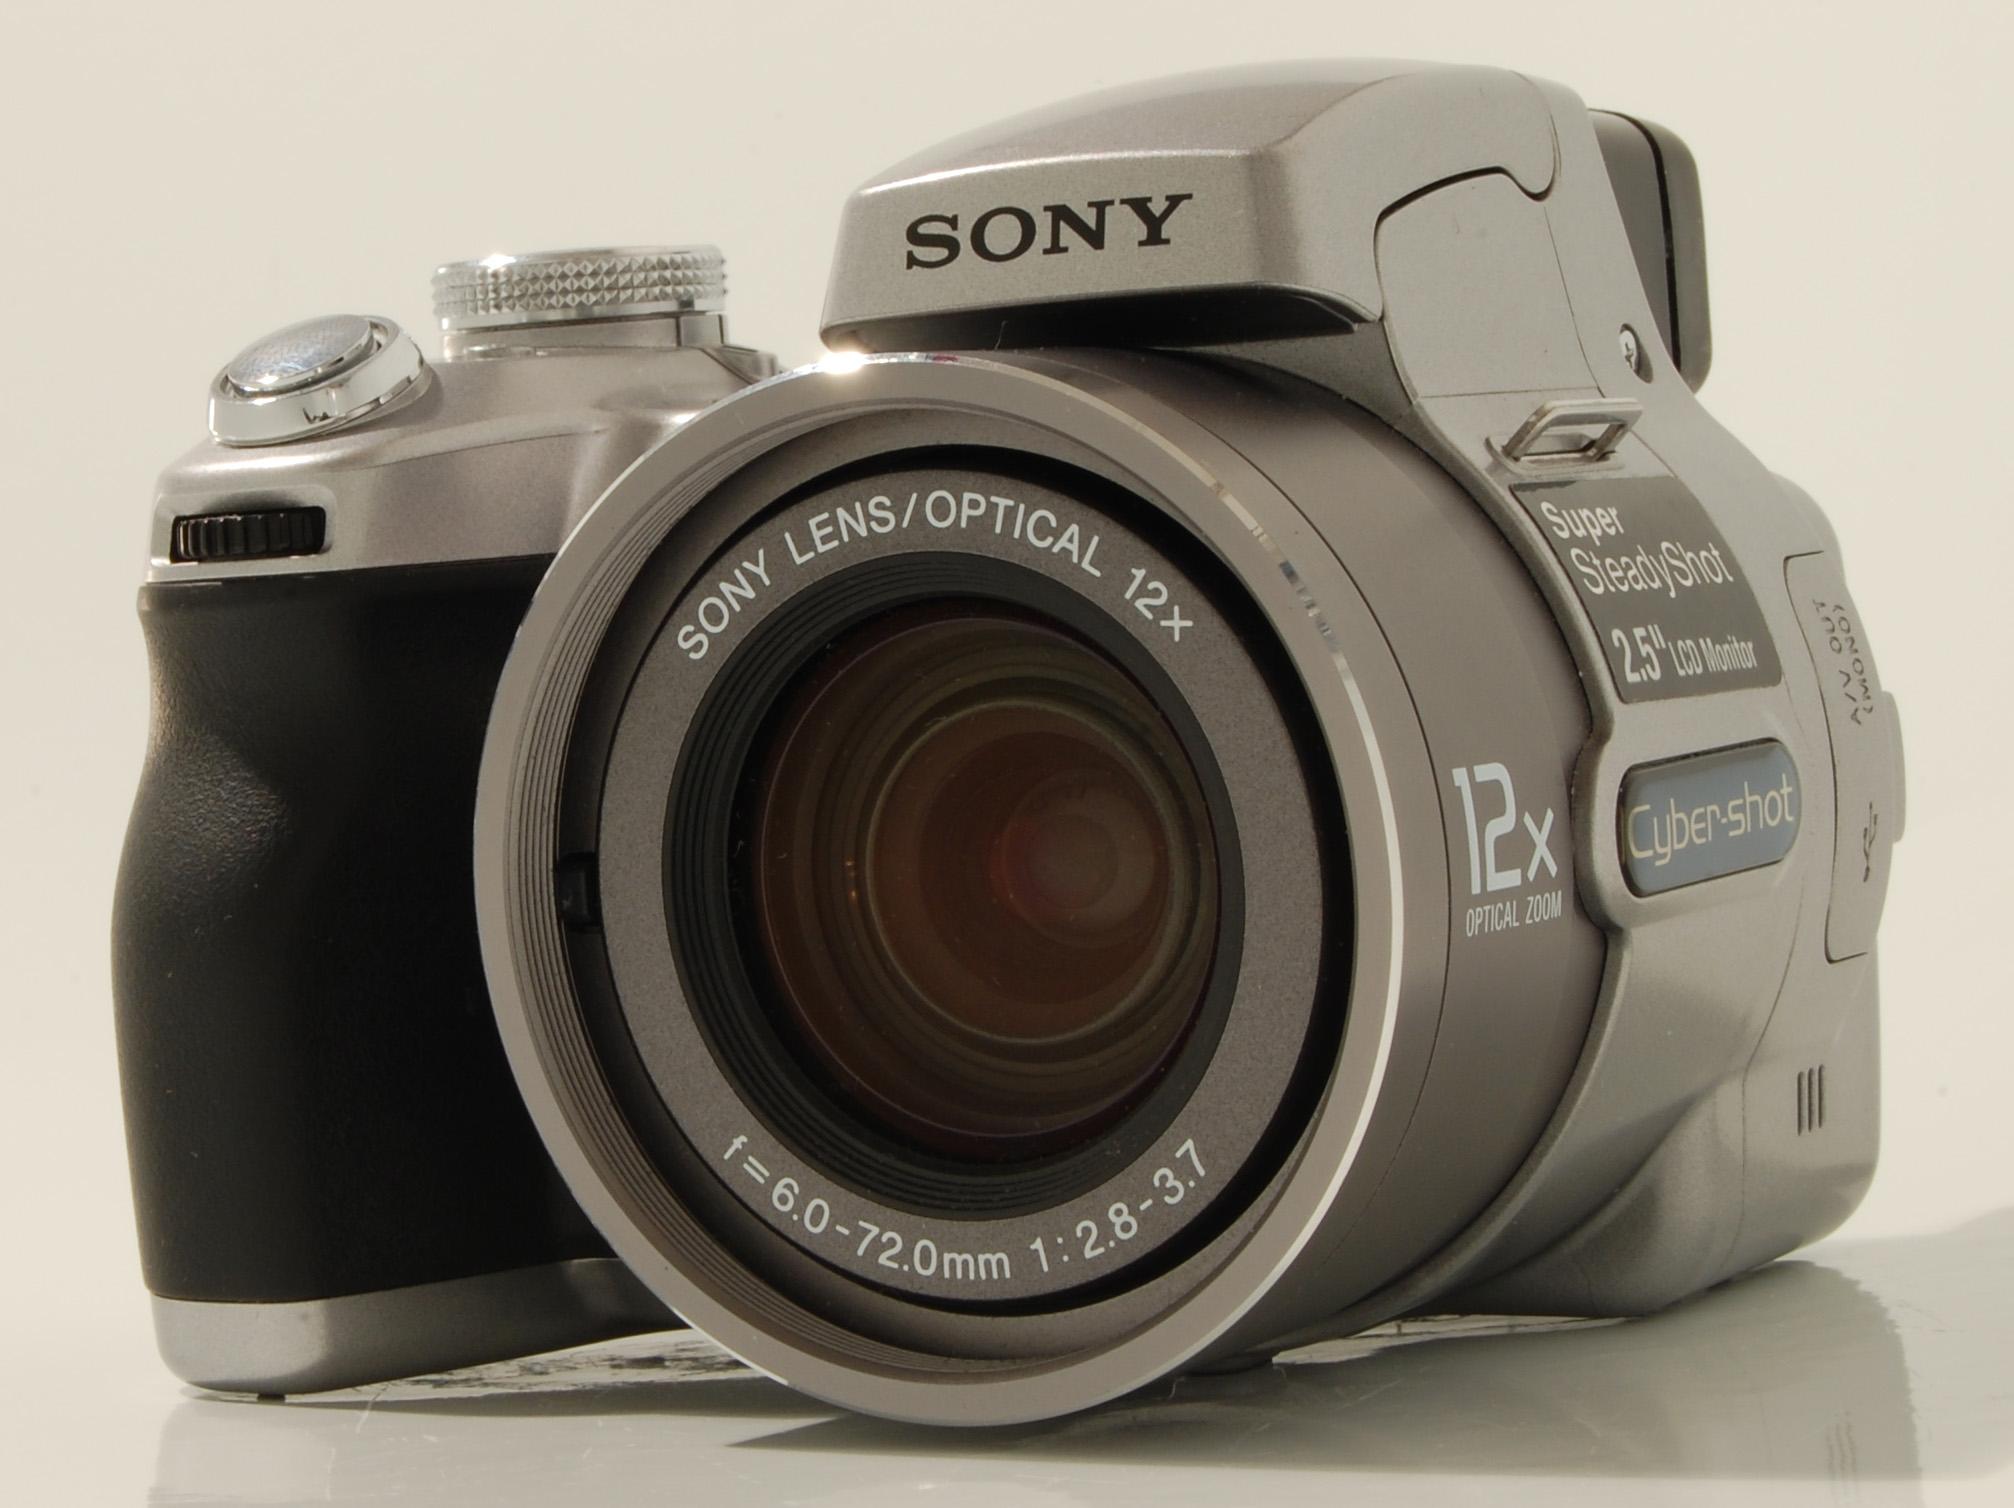 dsc h1 user manual daily instruction manual guides u2022 rh testingwordpress co sony digital camera dslr-a200 manual manual sony camera digital